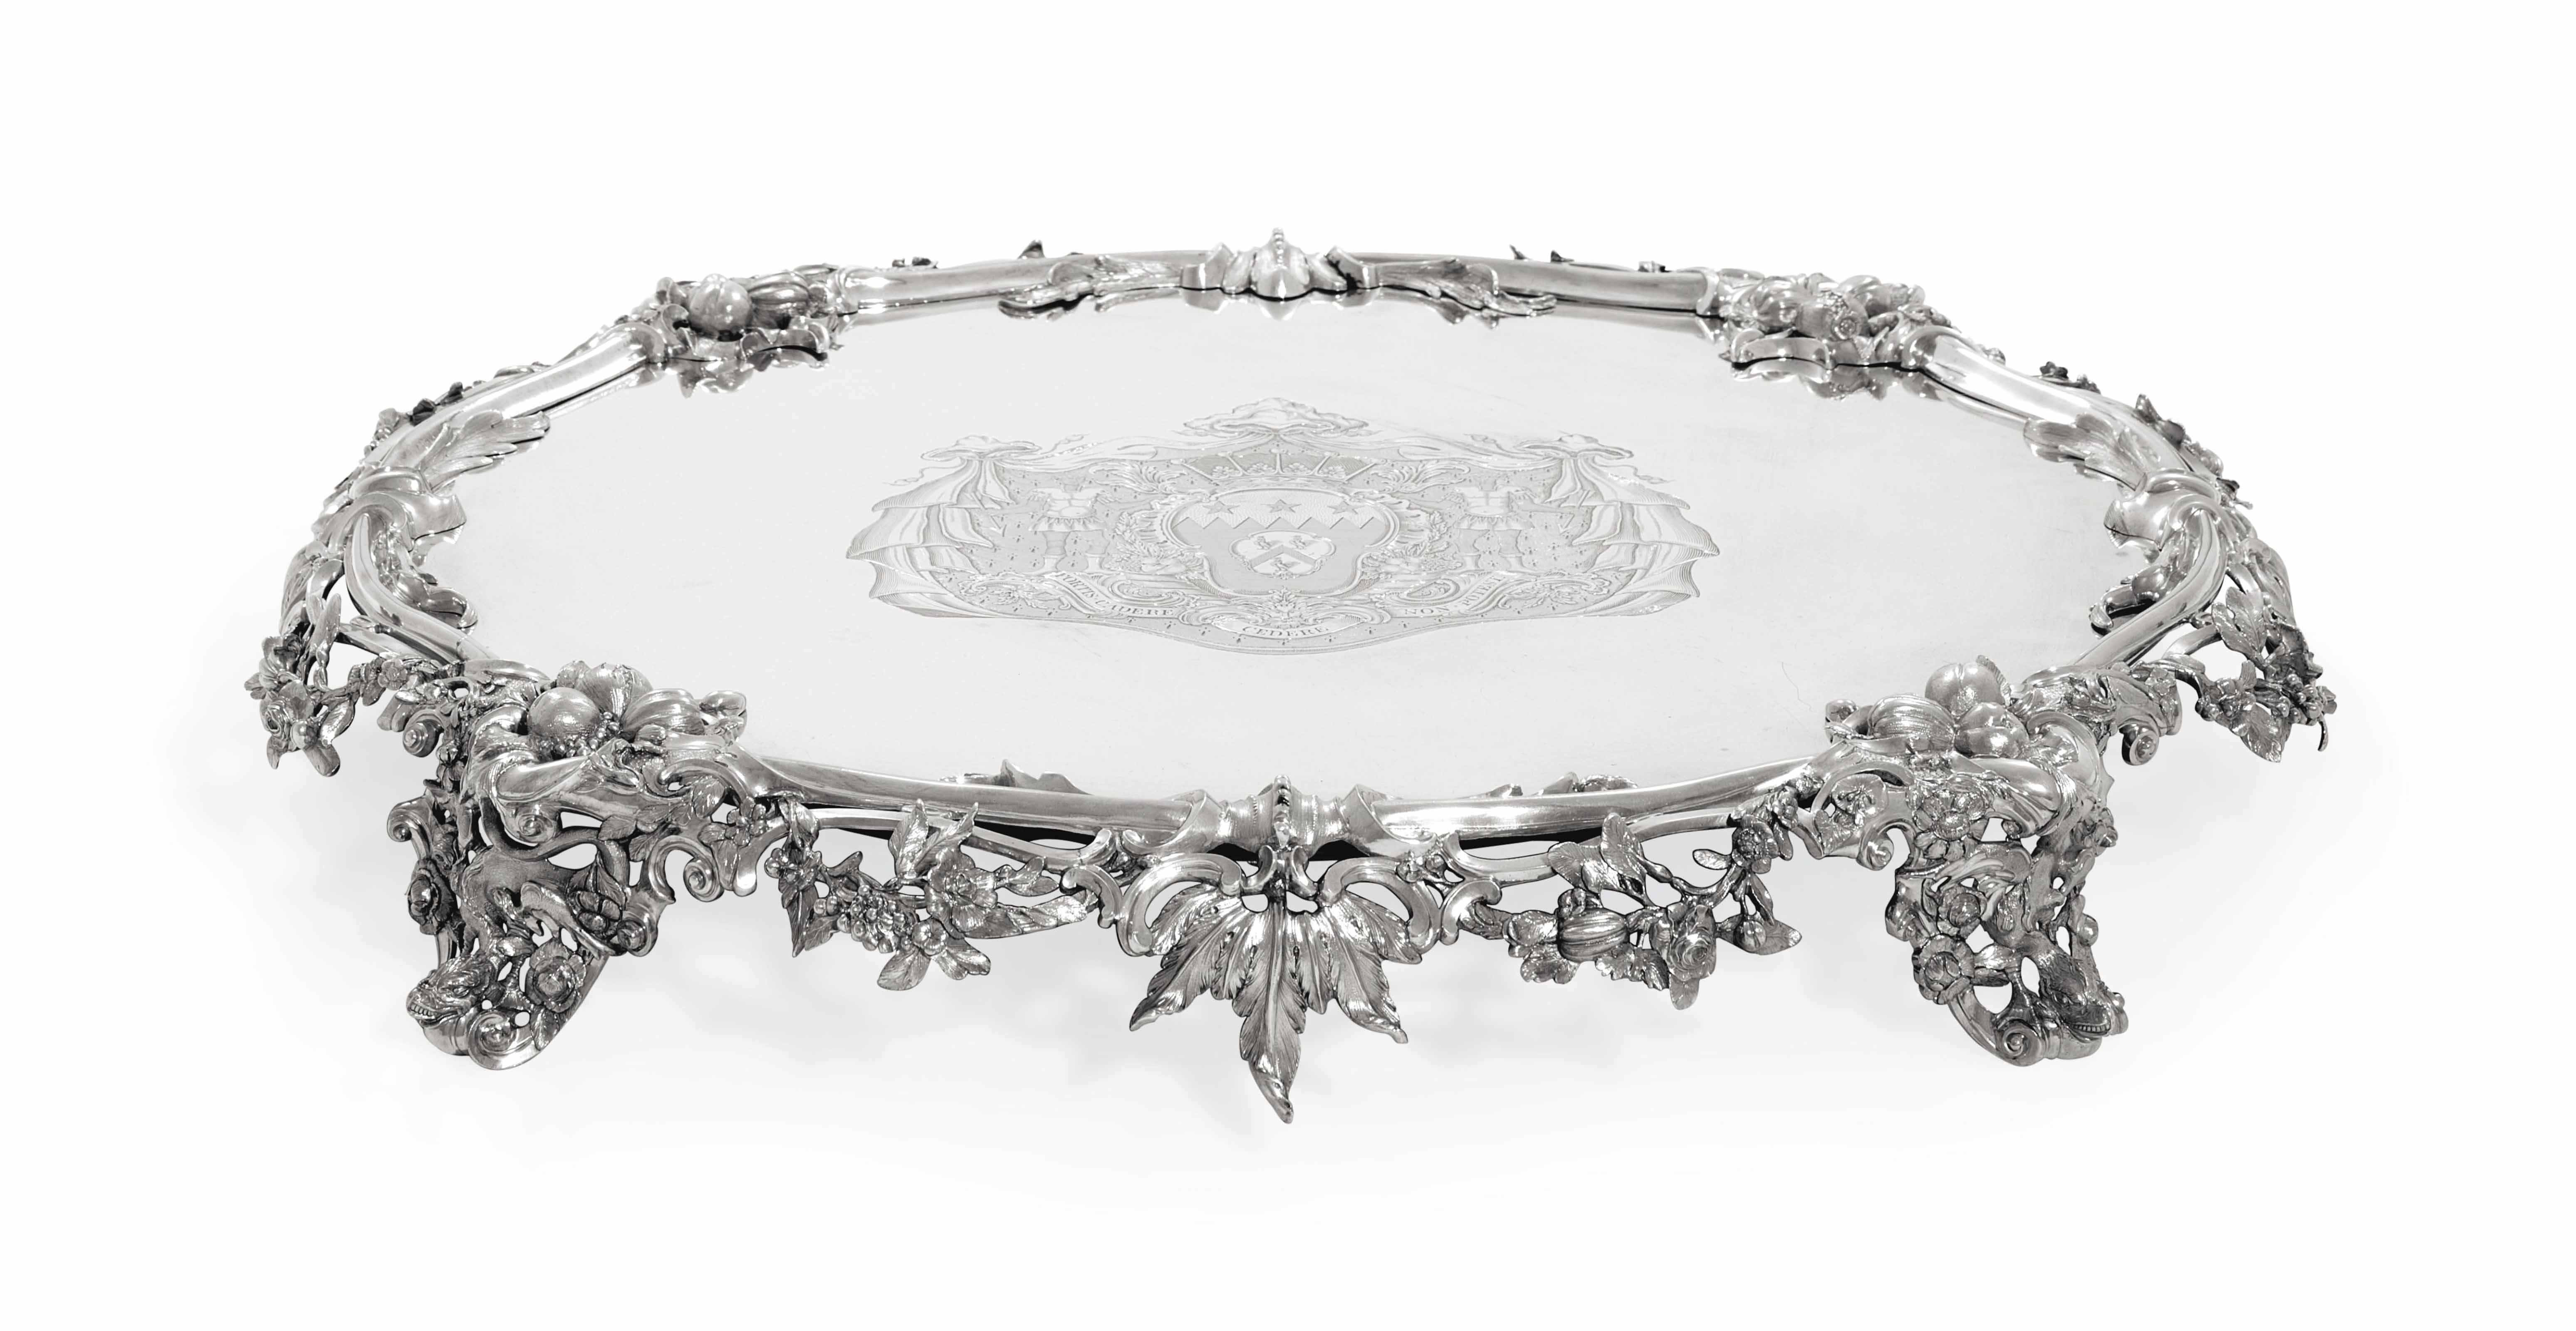 A GEORGE II SILVER TABLE PLATEAU